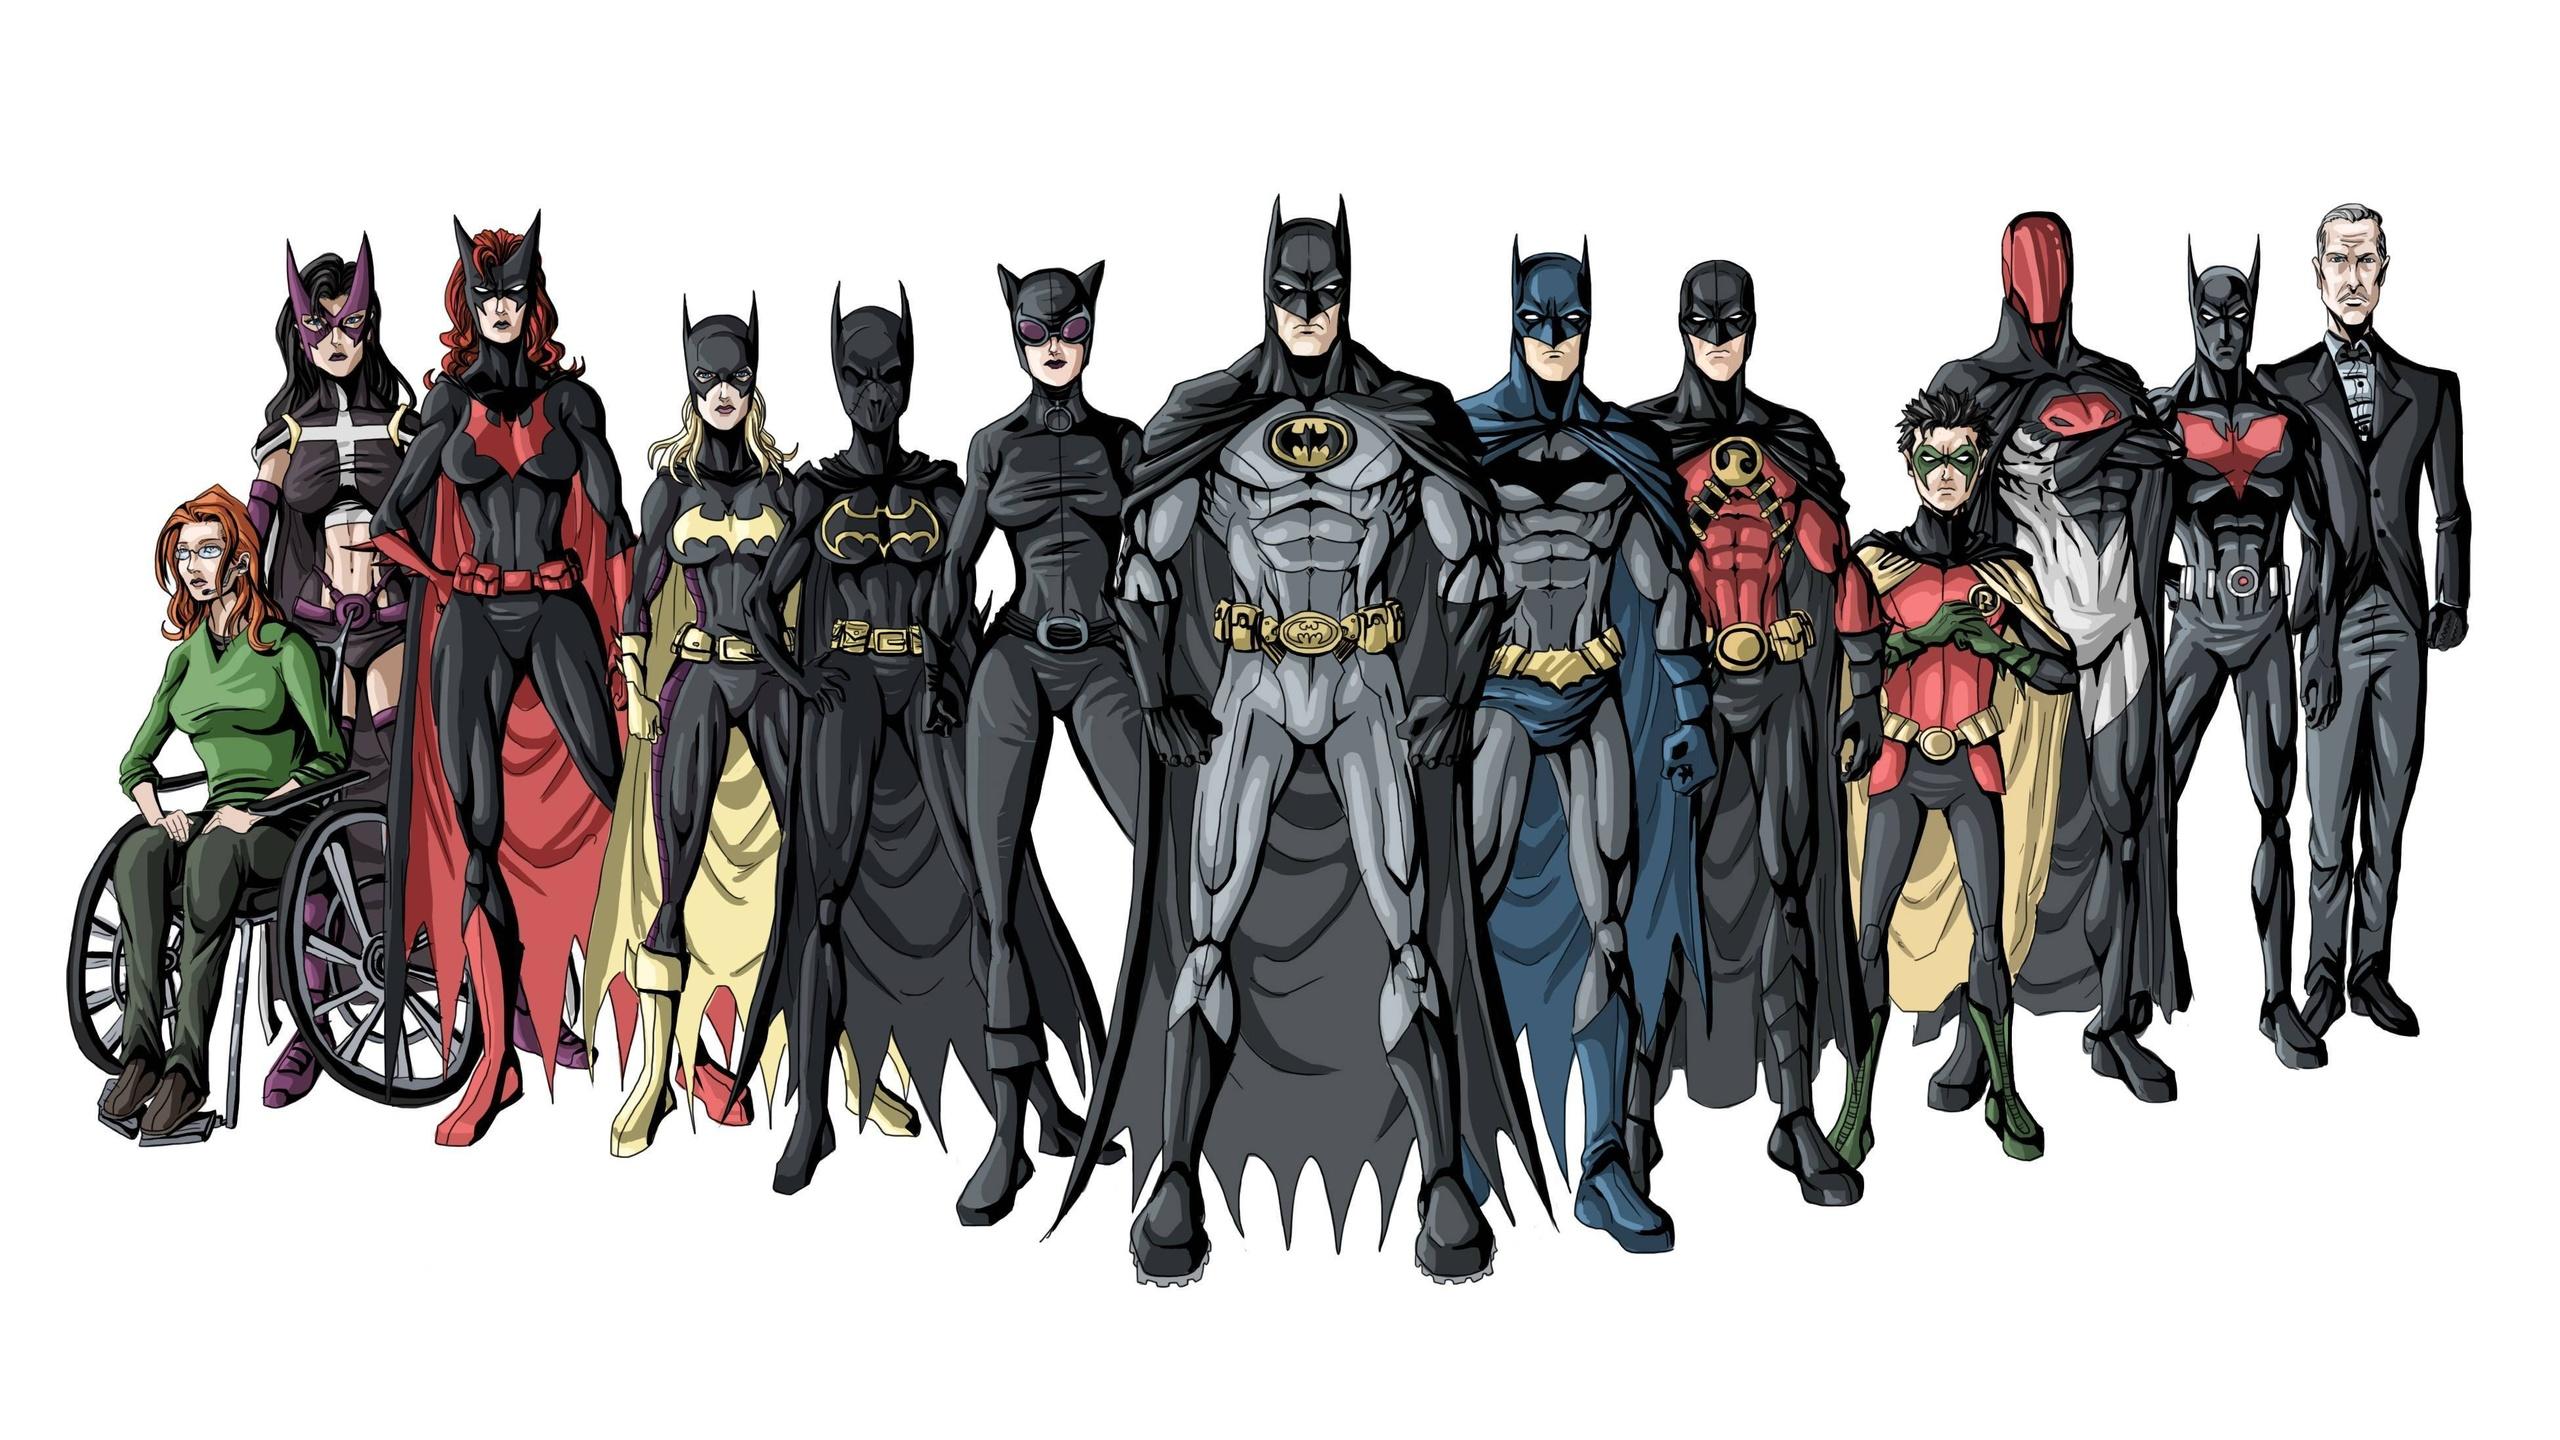 General 2560x1440 Batman Batgirl Batwoman Catwoman Robin (character) Alfred superhero Oracle Batman Beyond